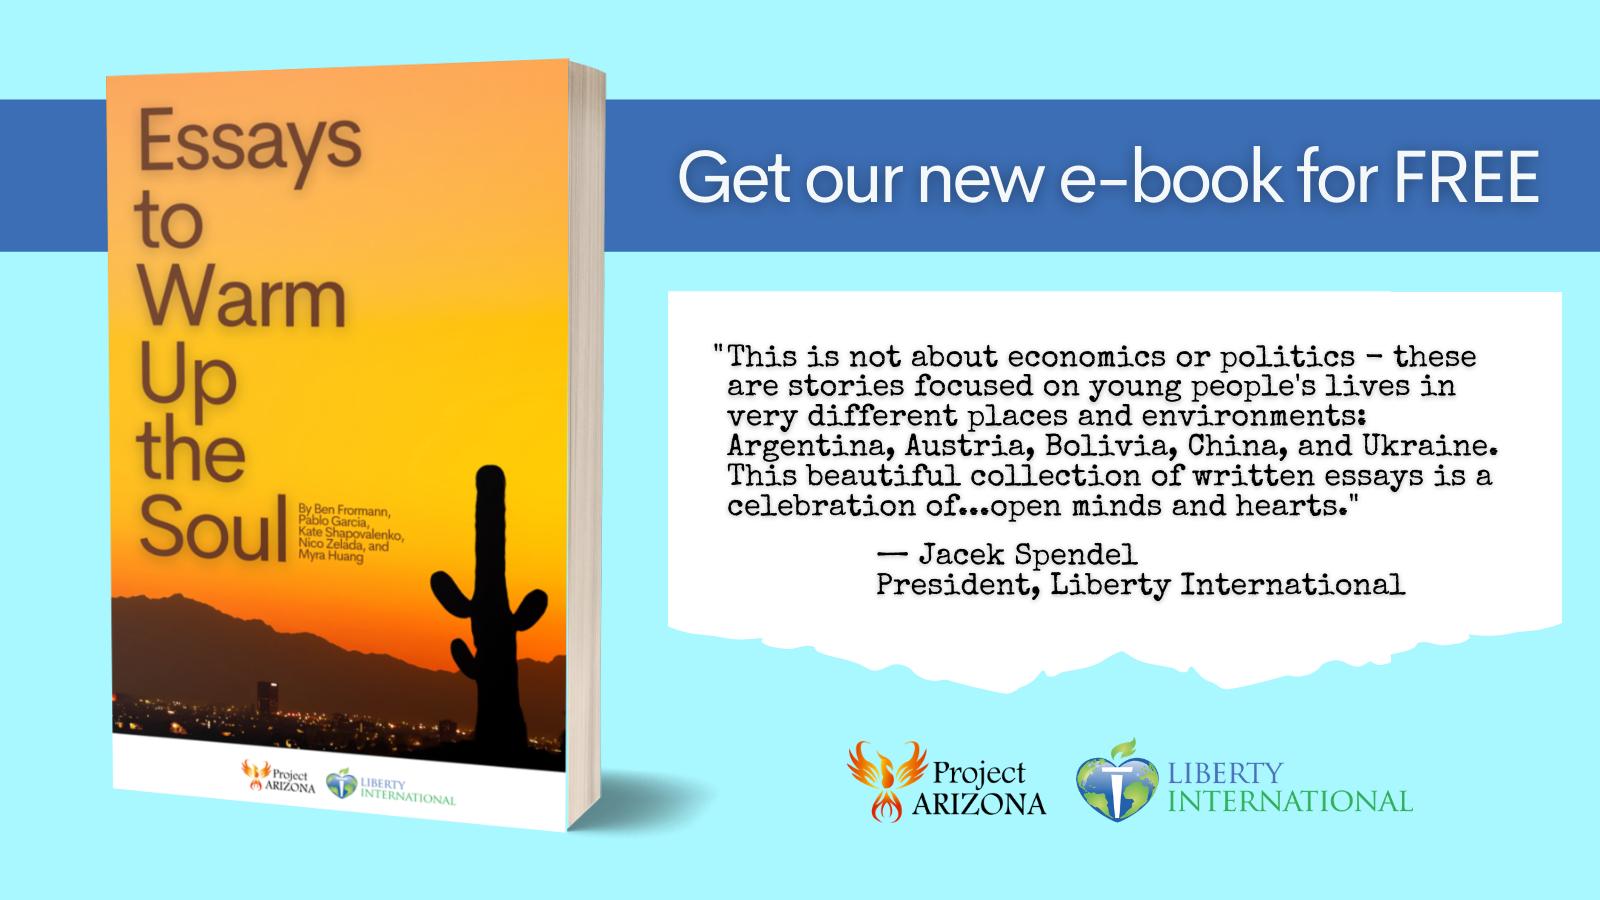 New Liberty International's E-book